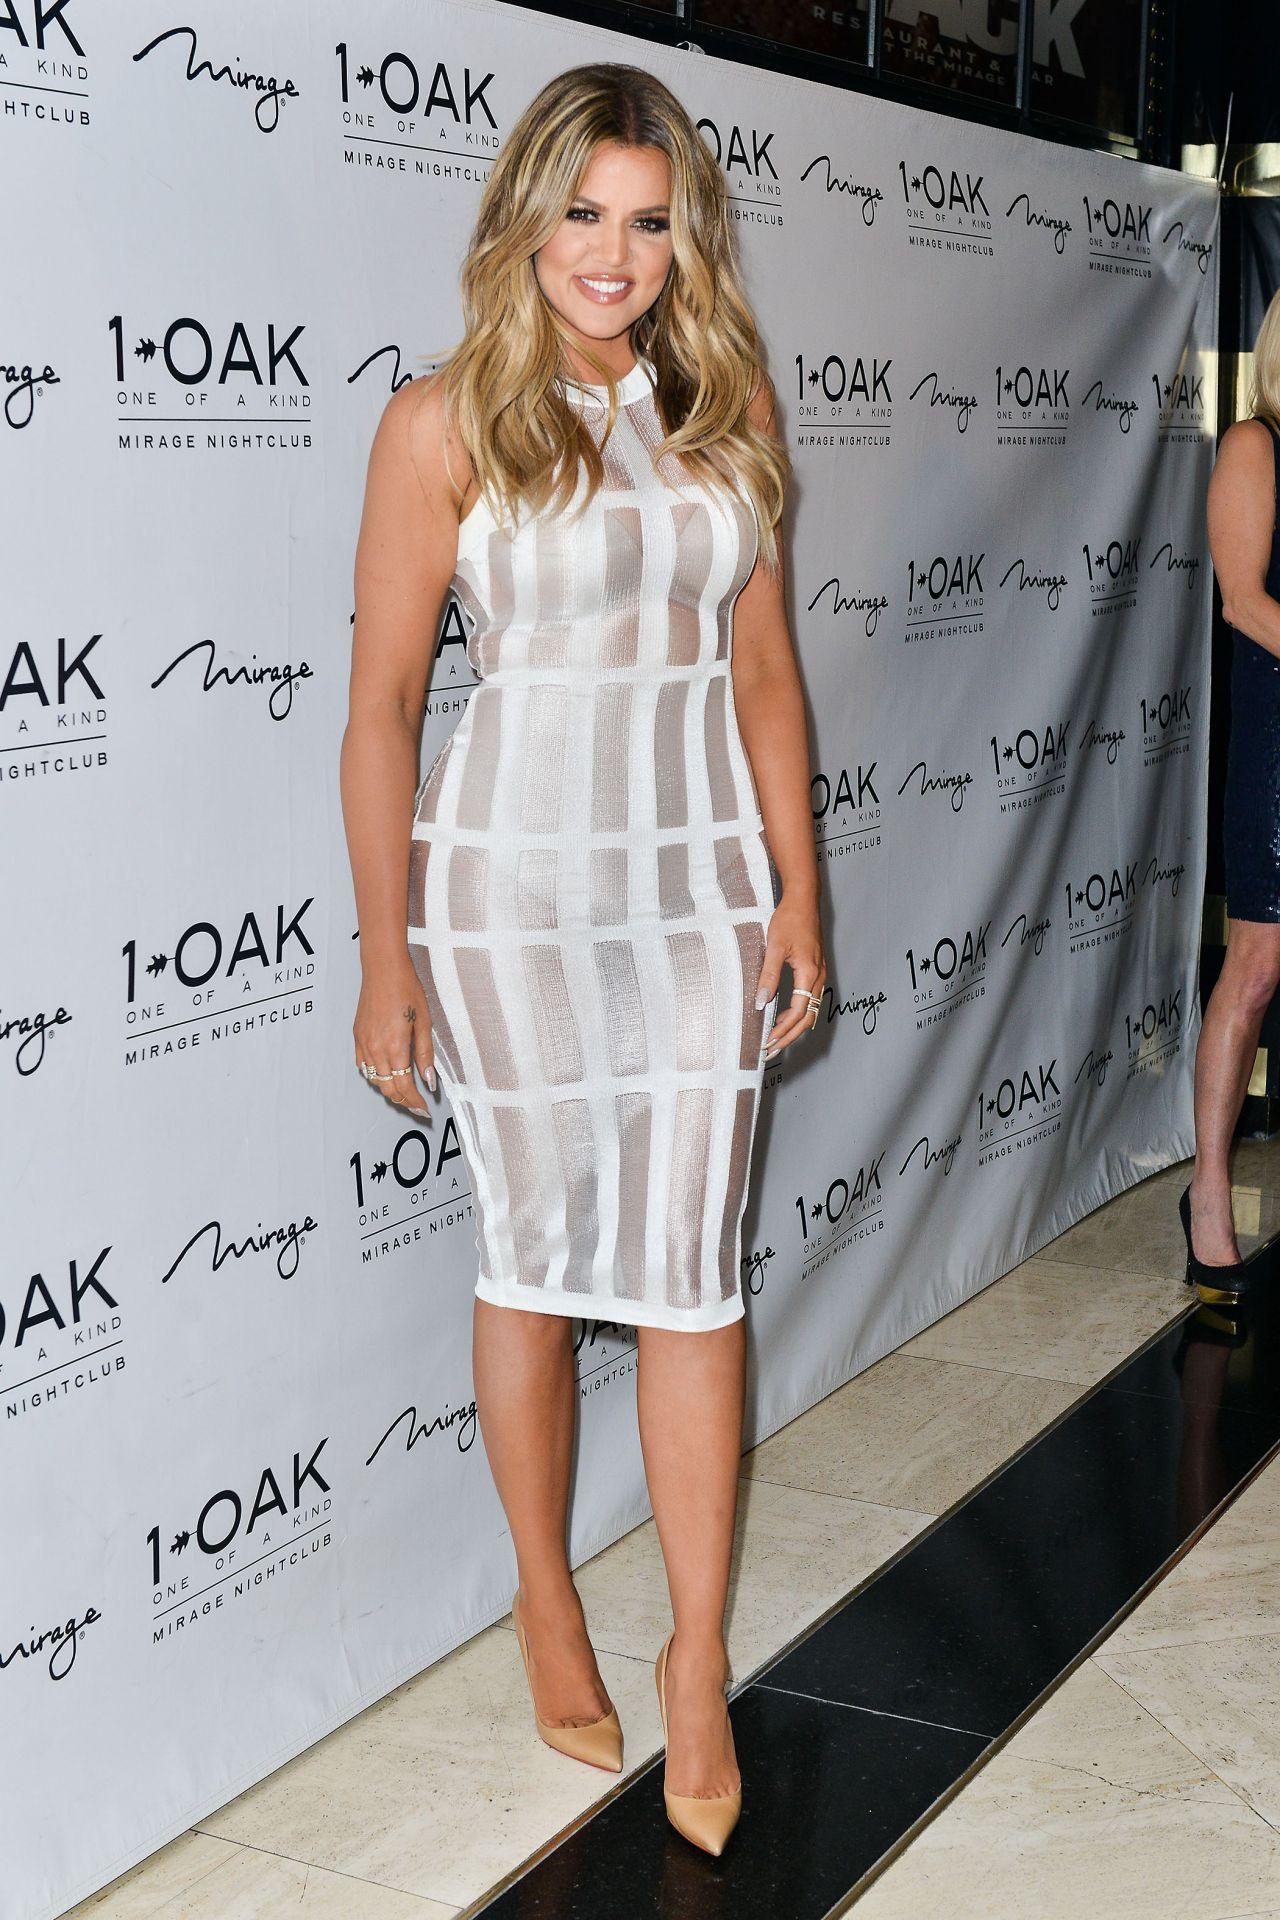 khloé kardashian: chirurgie esthetique